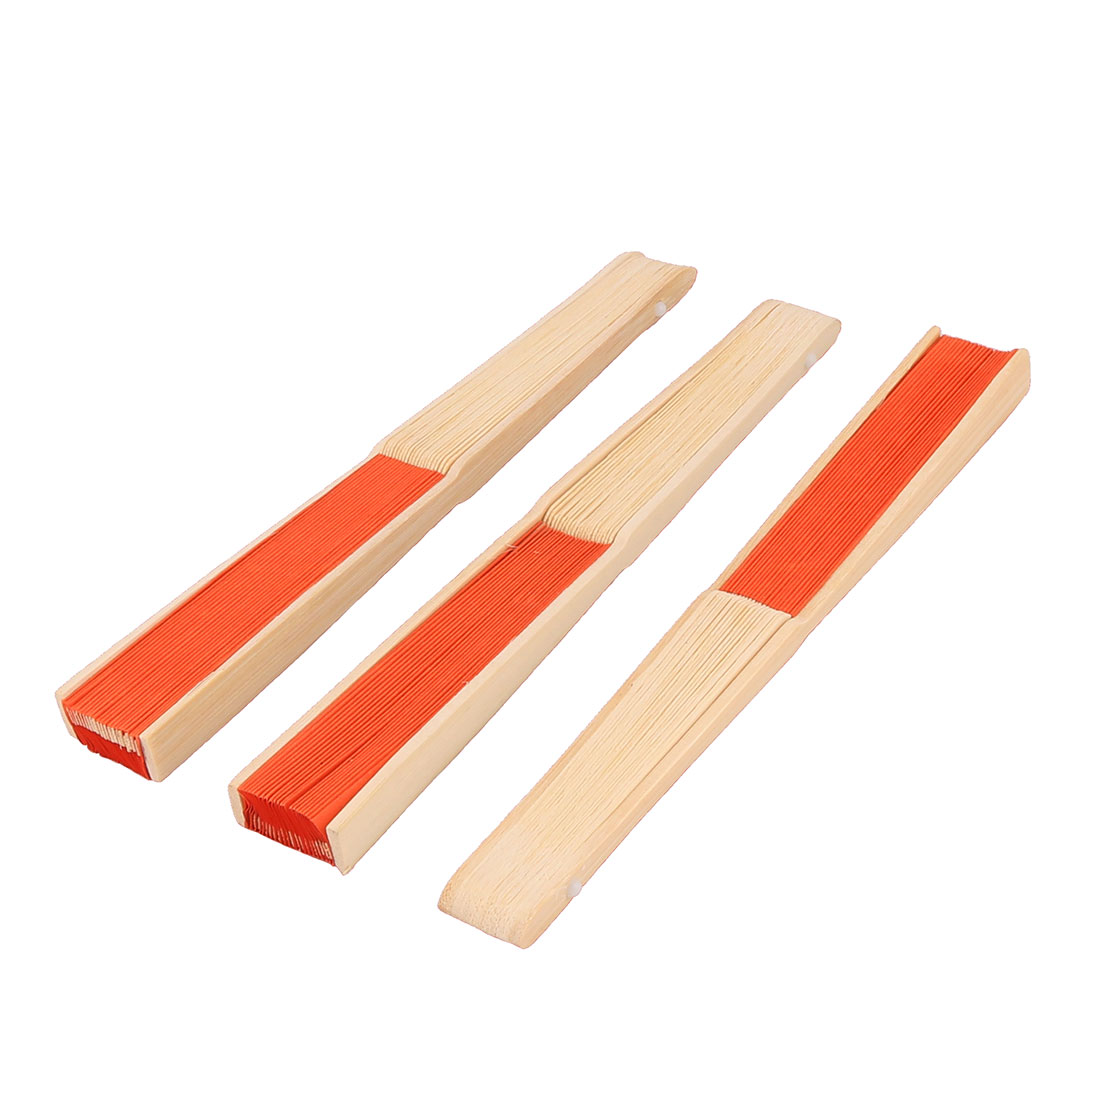 Ladies Wedding Party Bamboo Frame Paper Handheld Folding Hand Fan Orange 3pcs